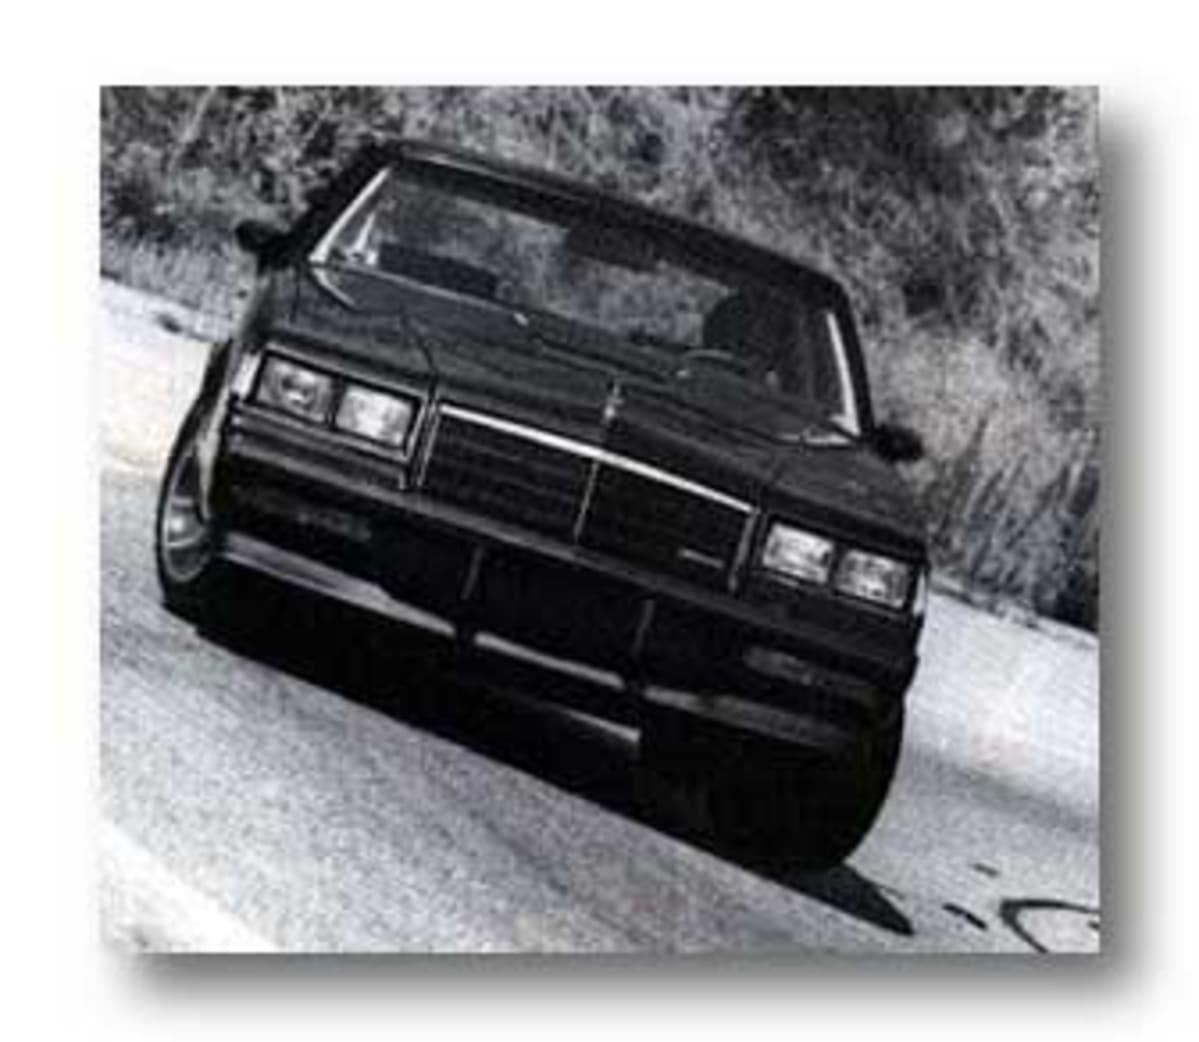 Buick Regal Grand National (Paul Martinez)